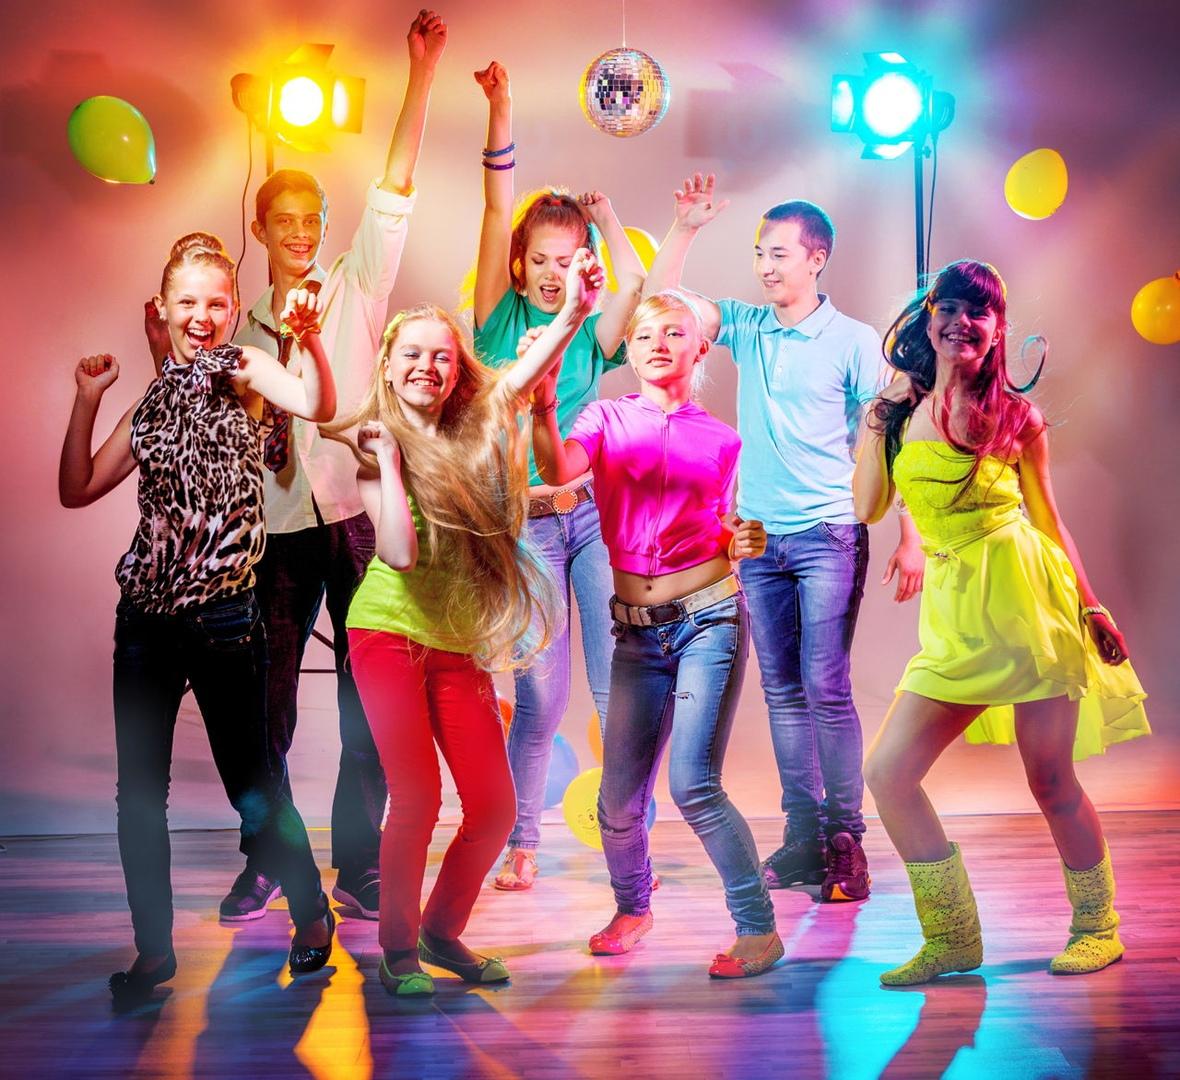 Танцы молодежь картинки